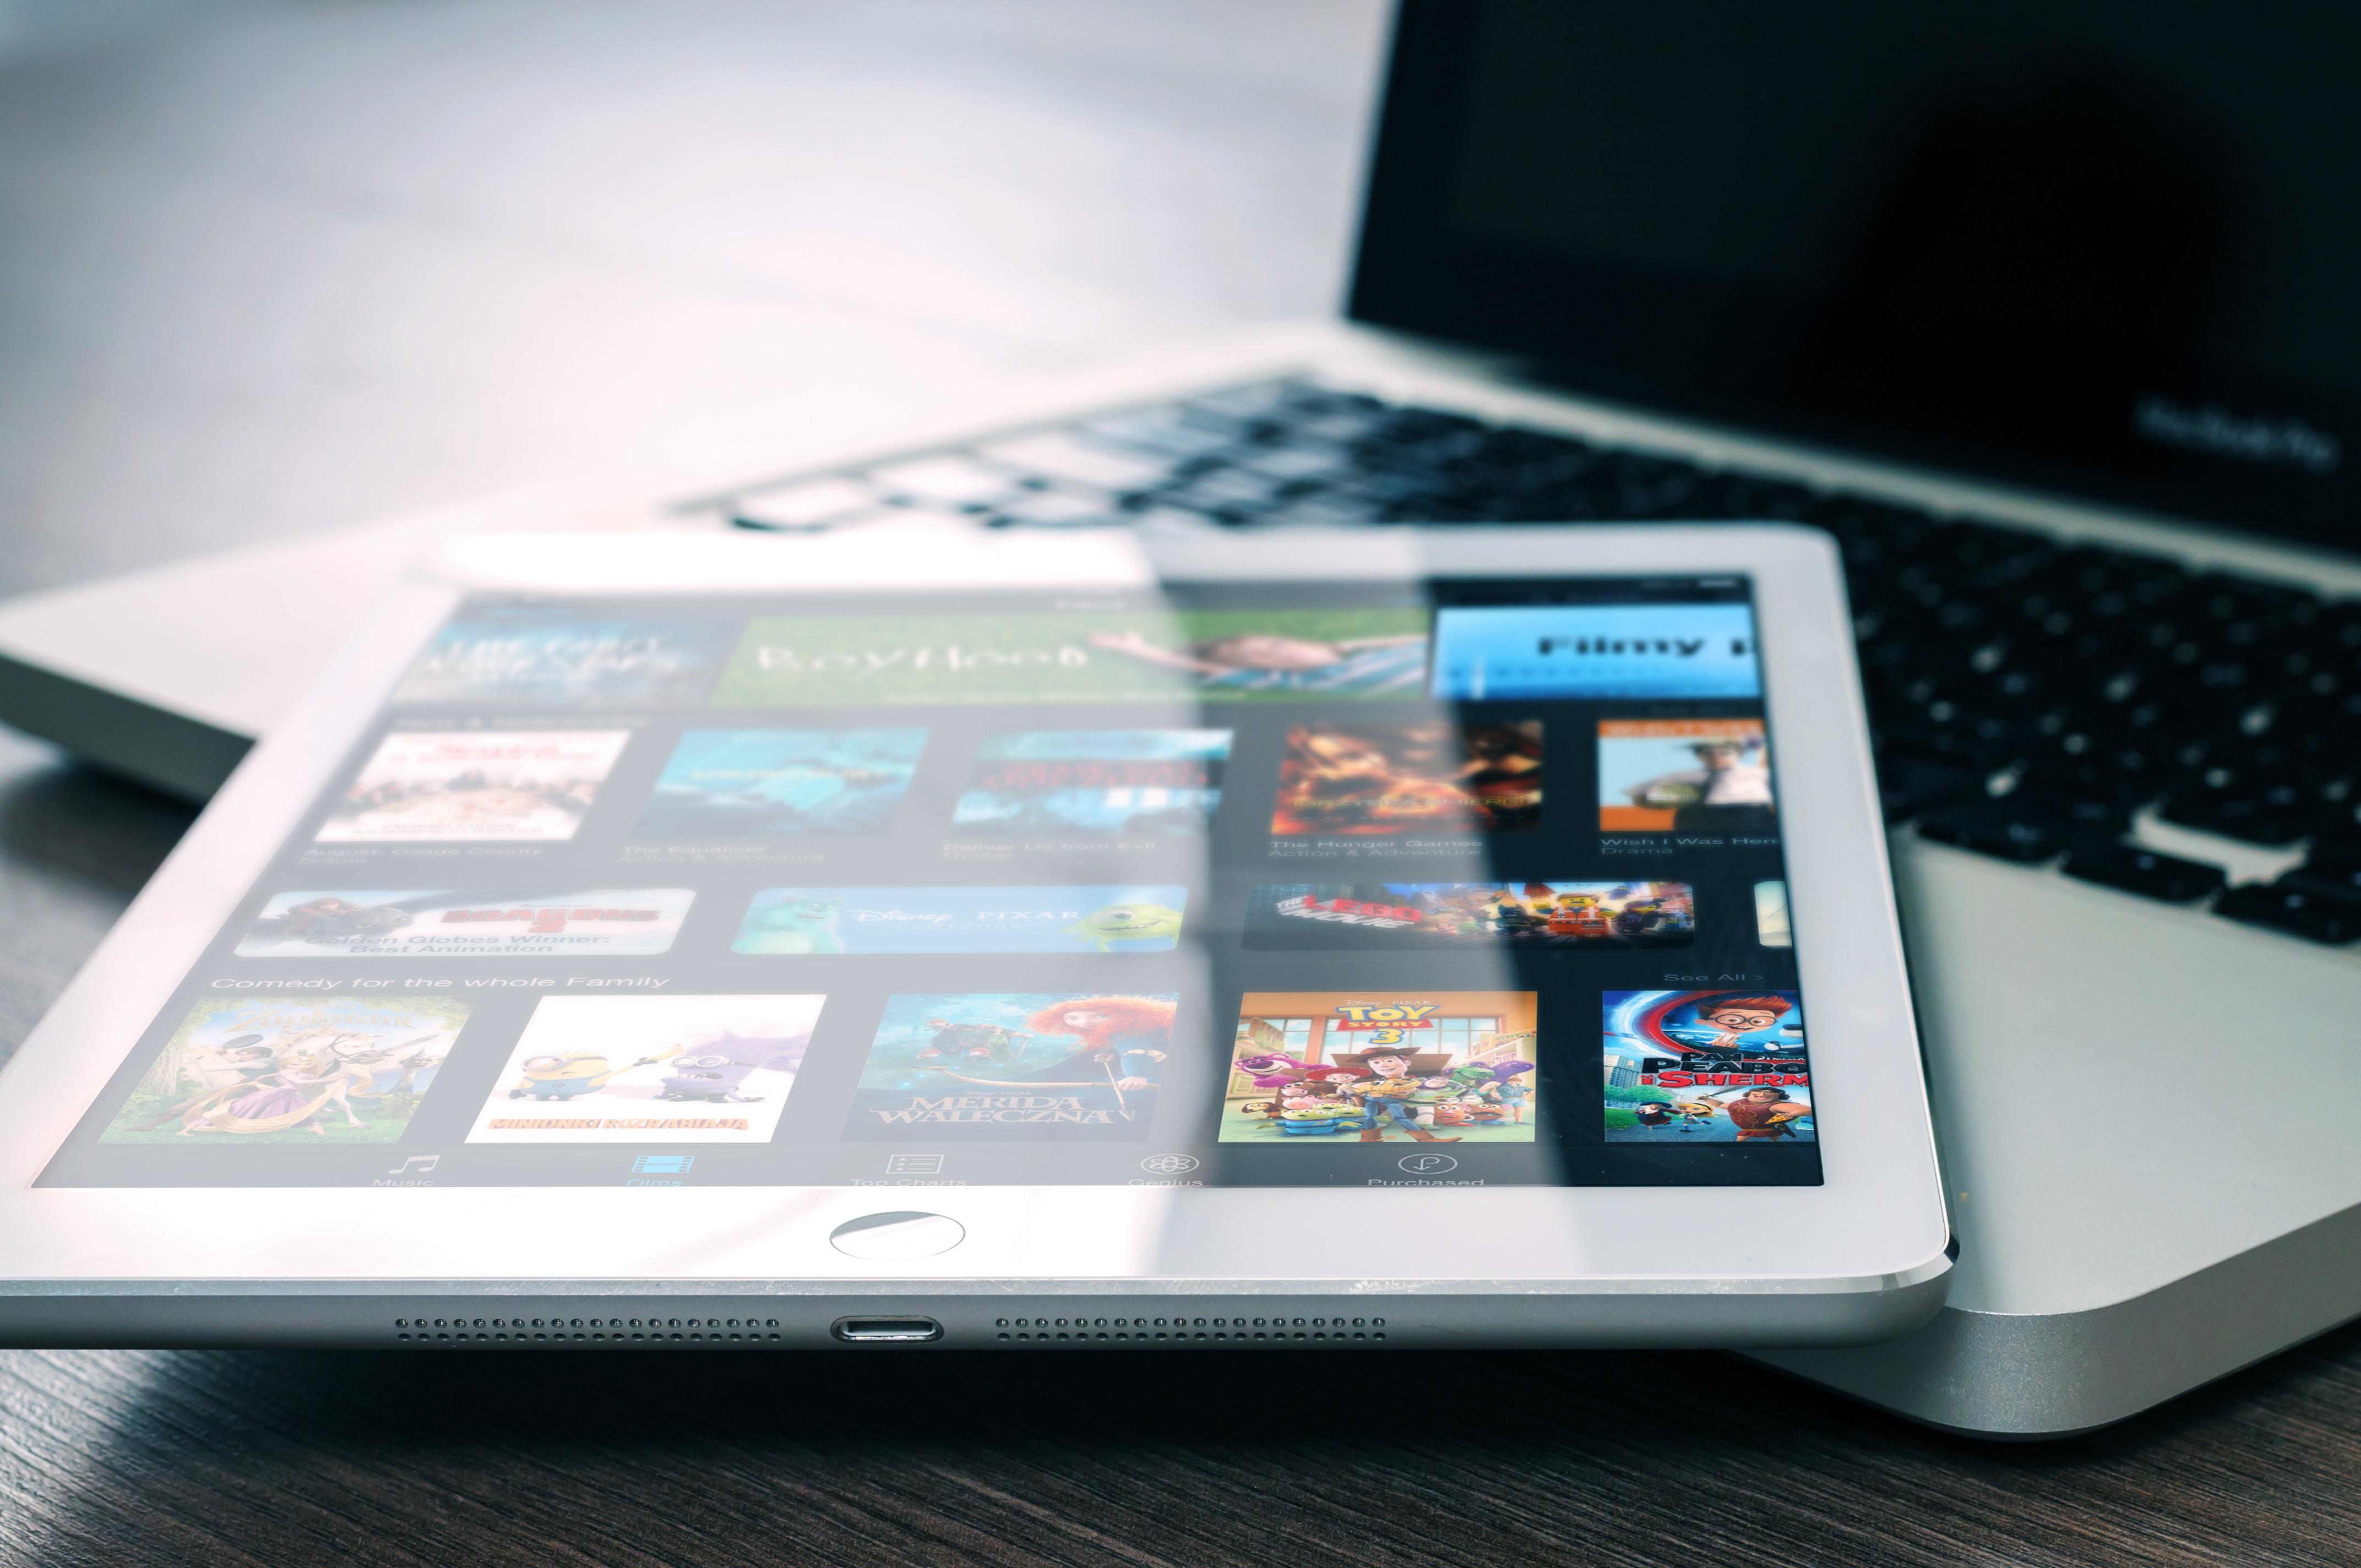 macbook pro marketing mix